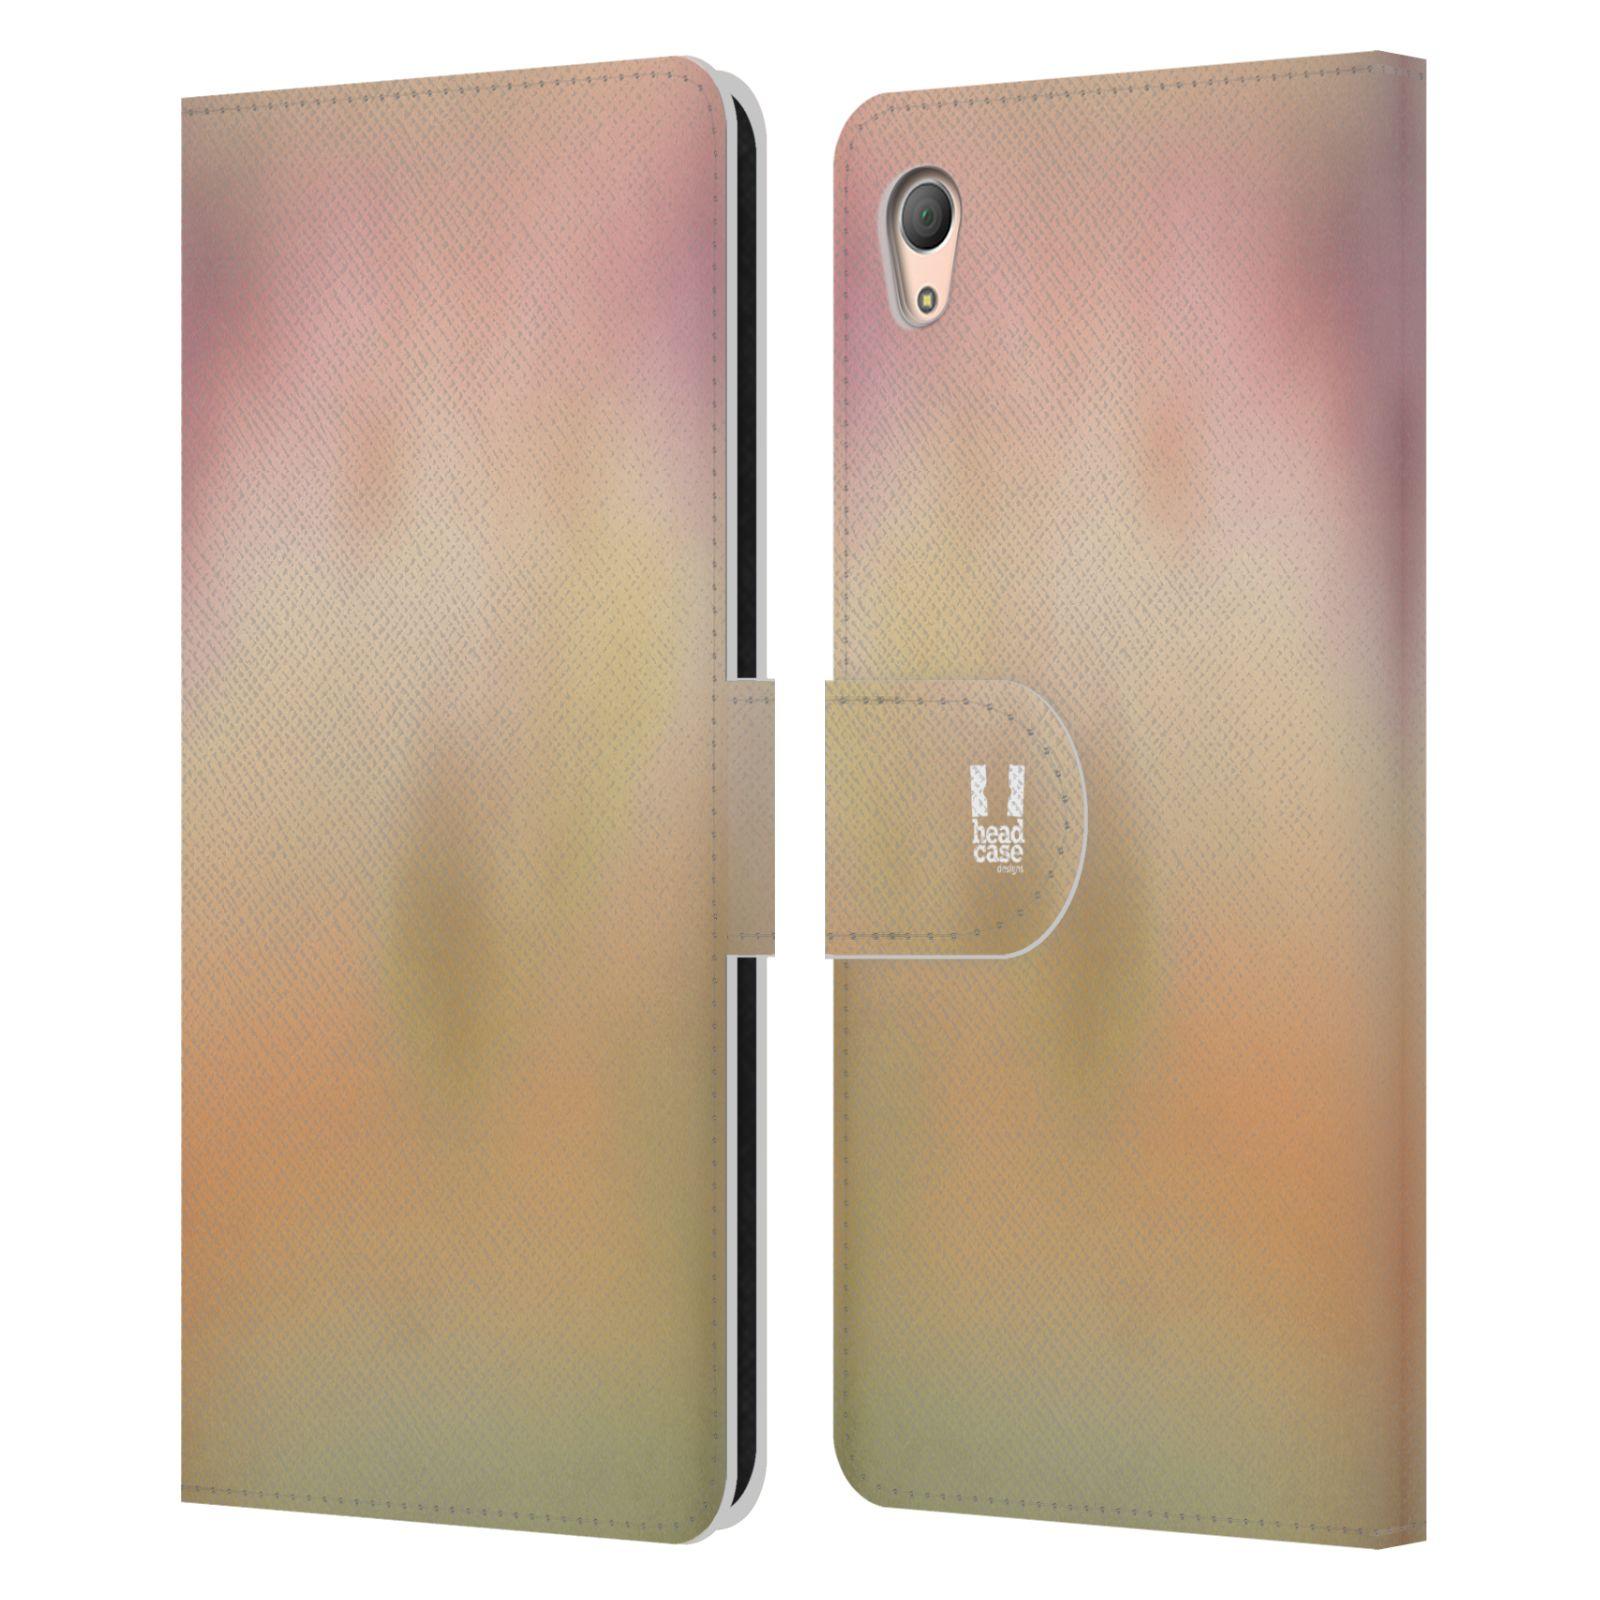 HEAD CASE Flipové pouzdro pro mobil SONY XPERIA Z3+ (PLUS) AQUAREL barvy NOSTALGIE